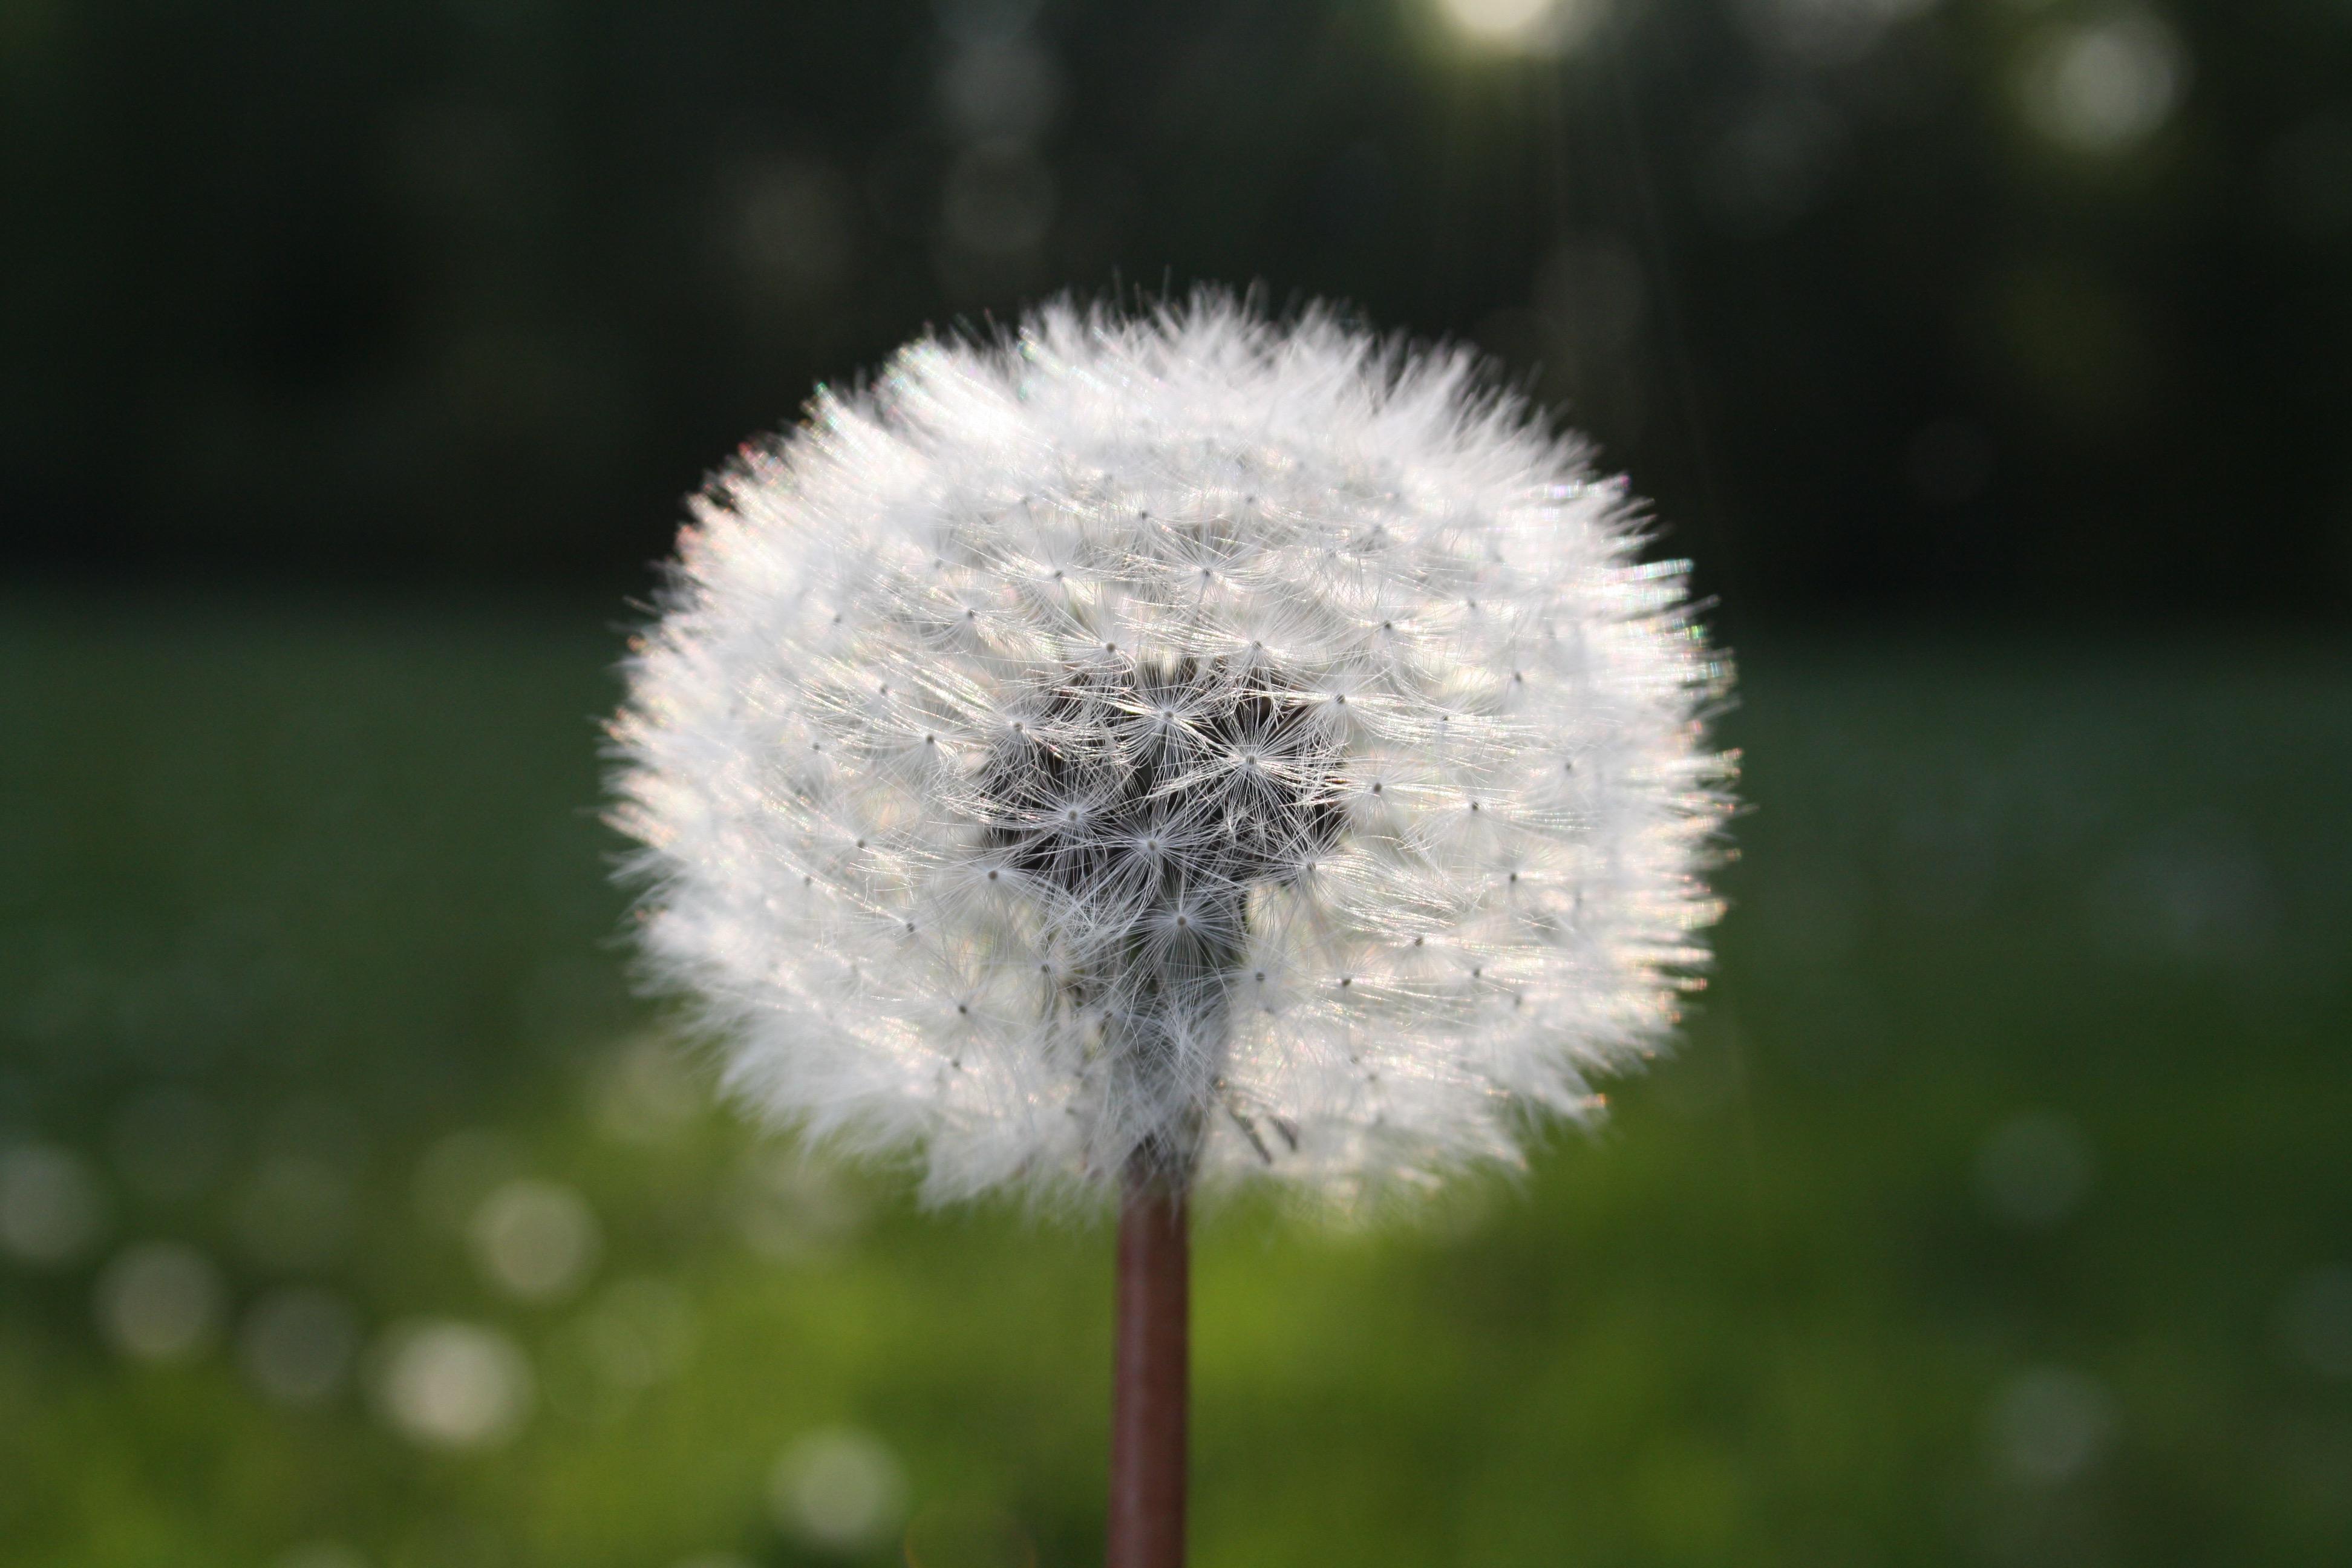 Dandelion puff-ball